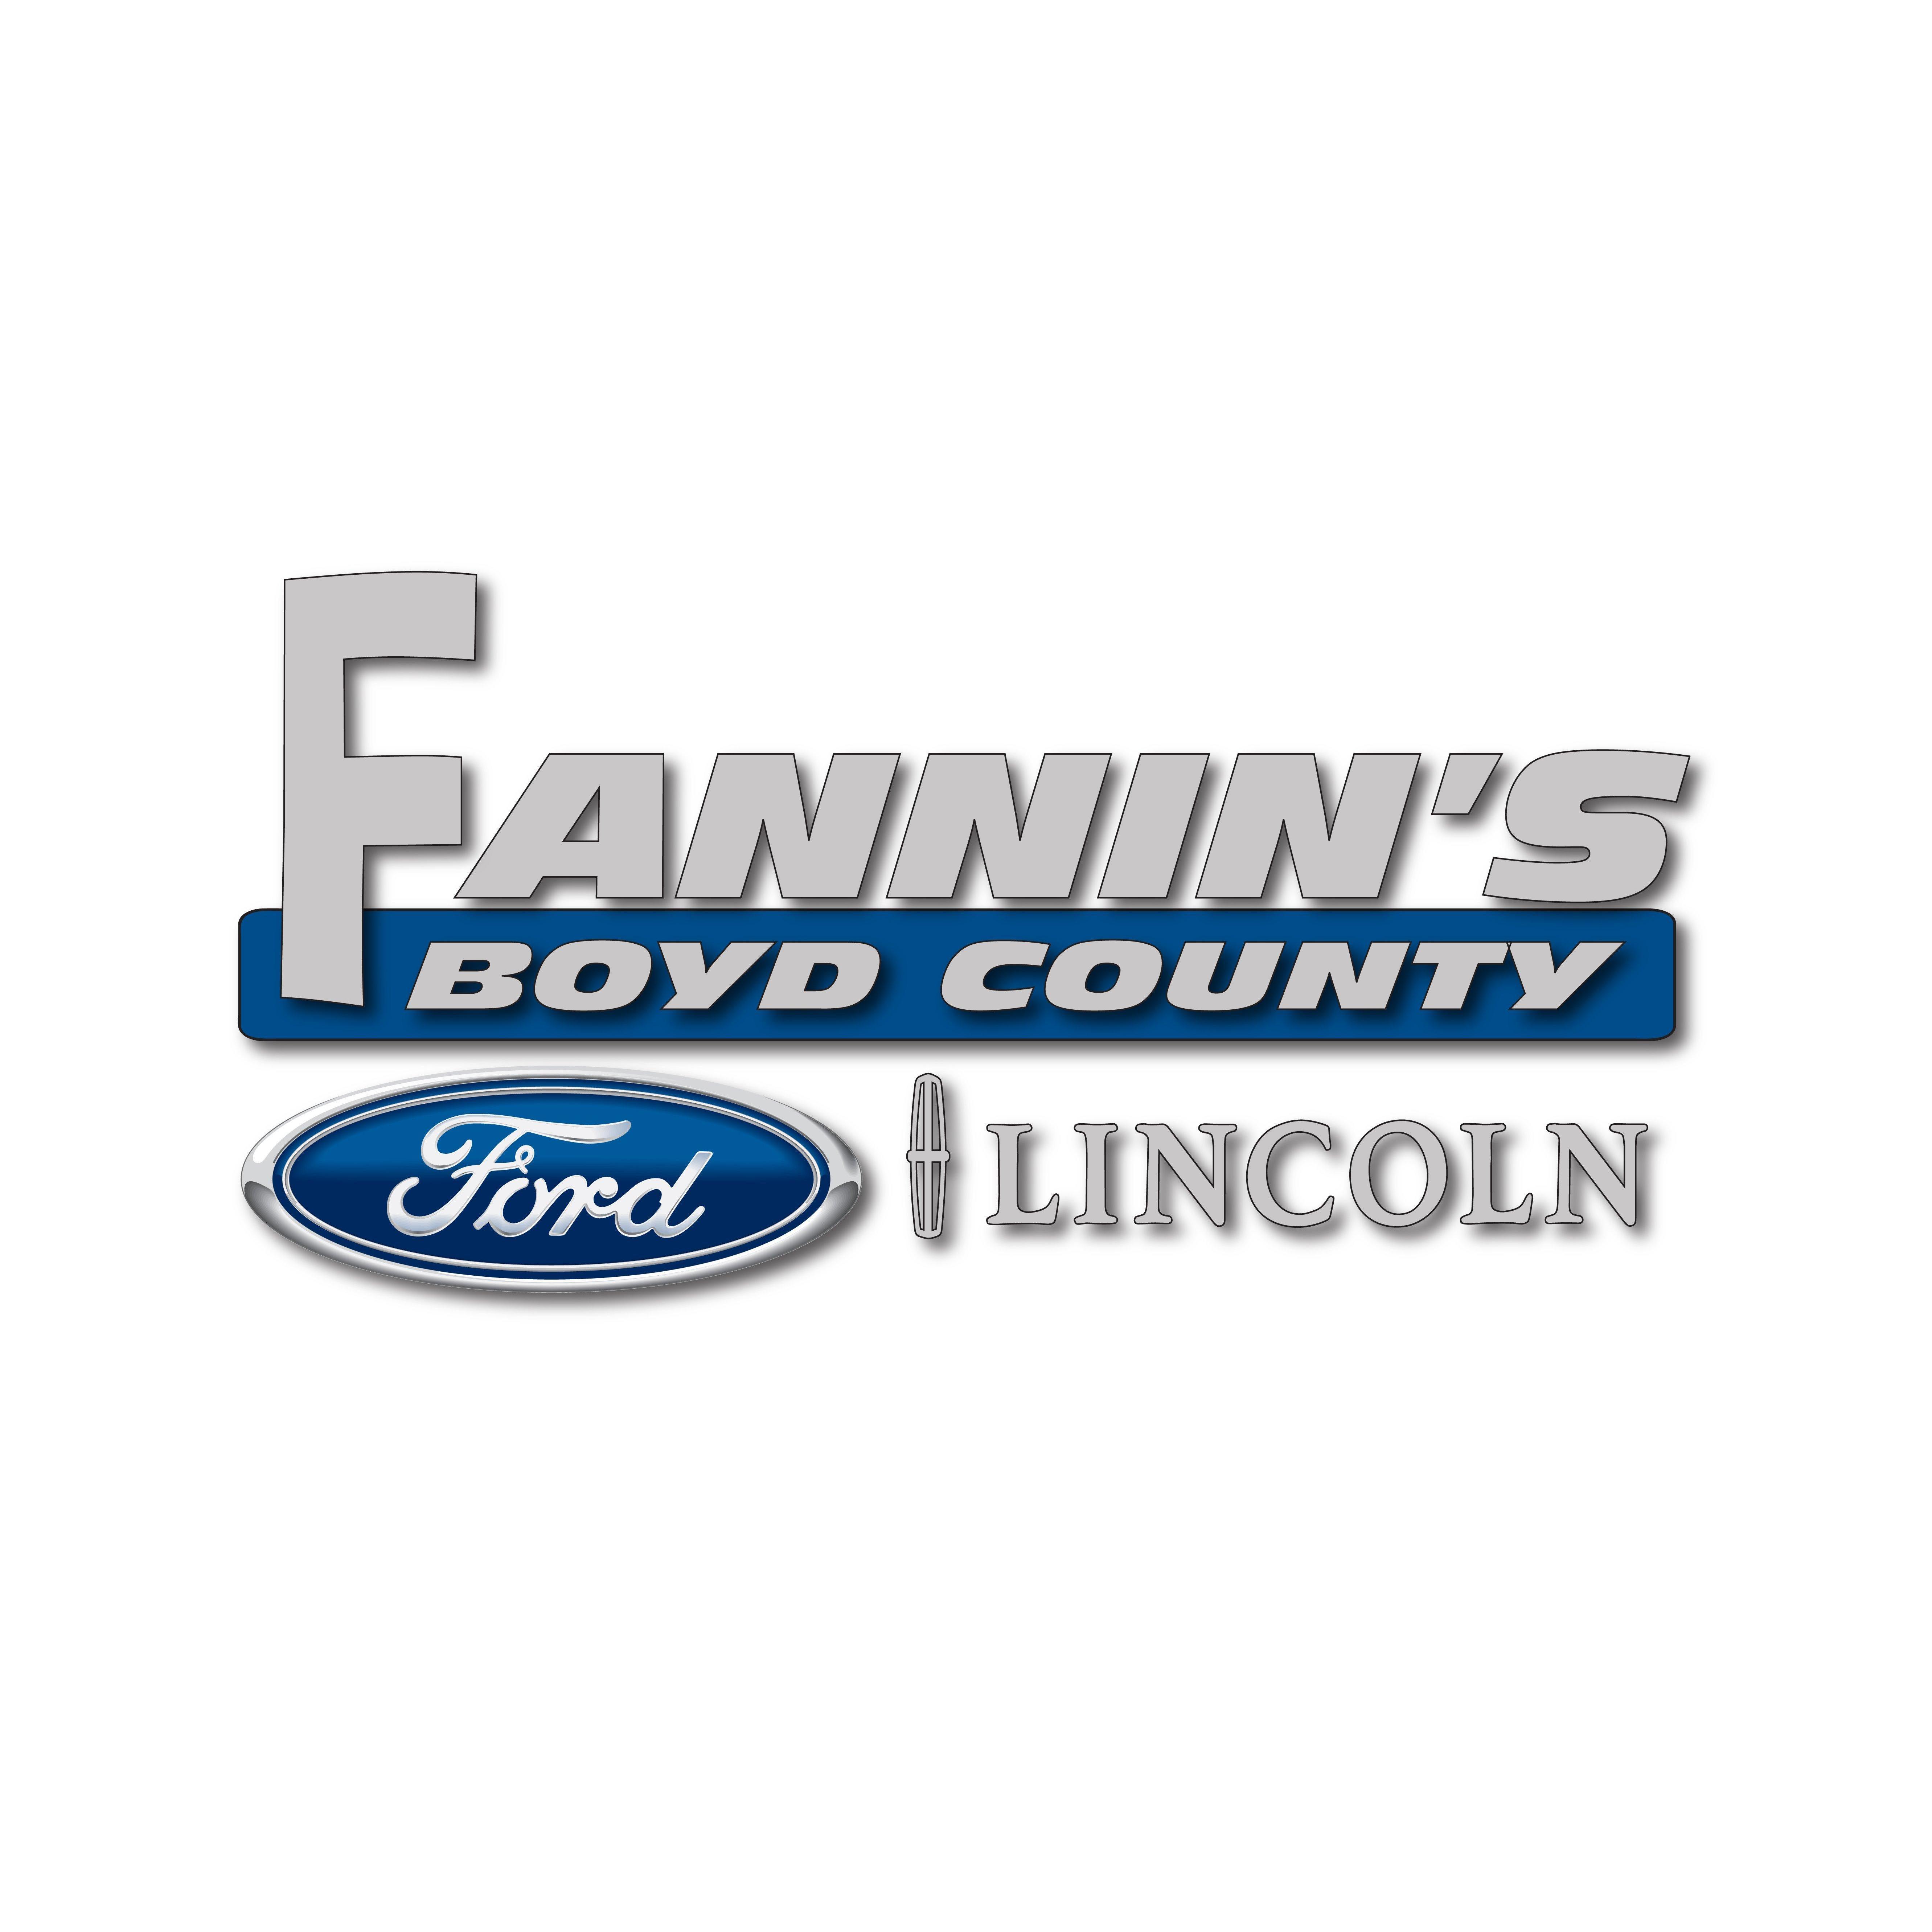 Fannin Boyd County Ford & Lincoln image 2